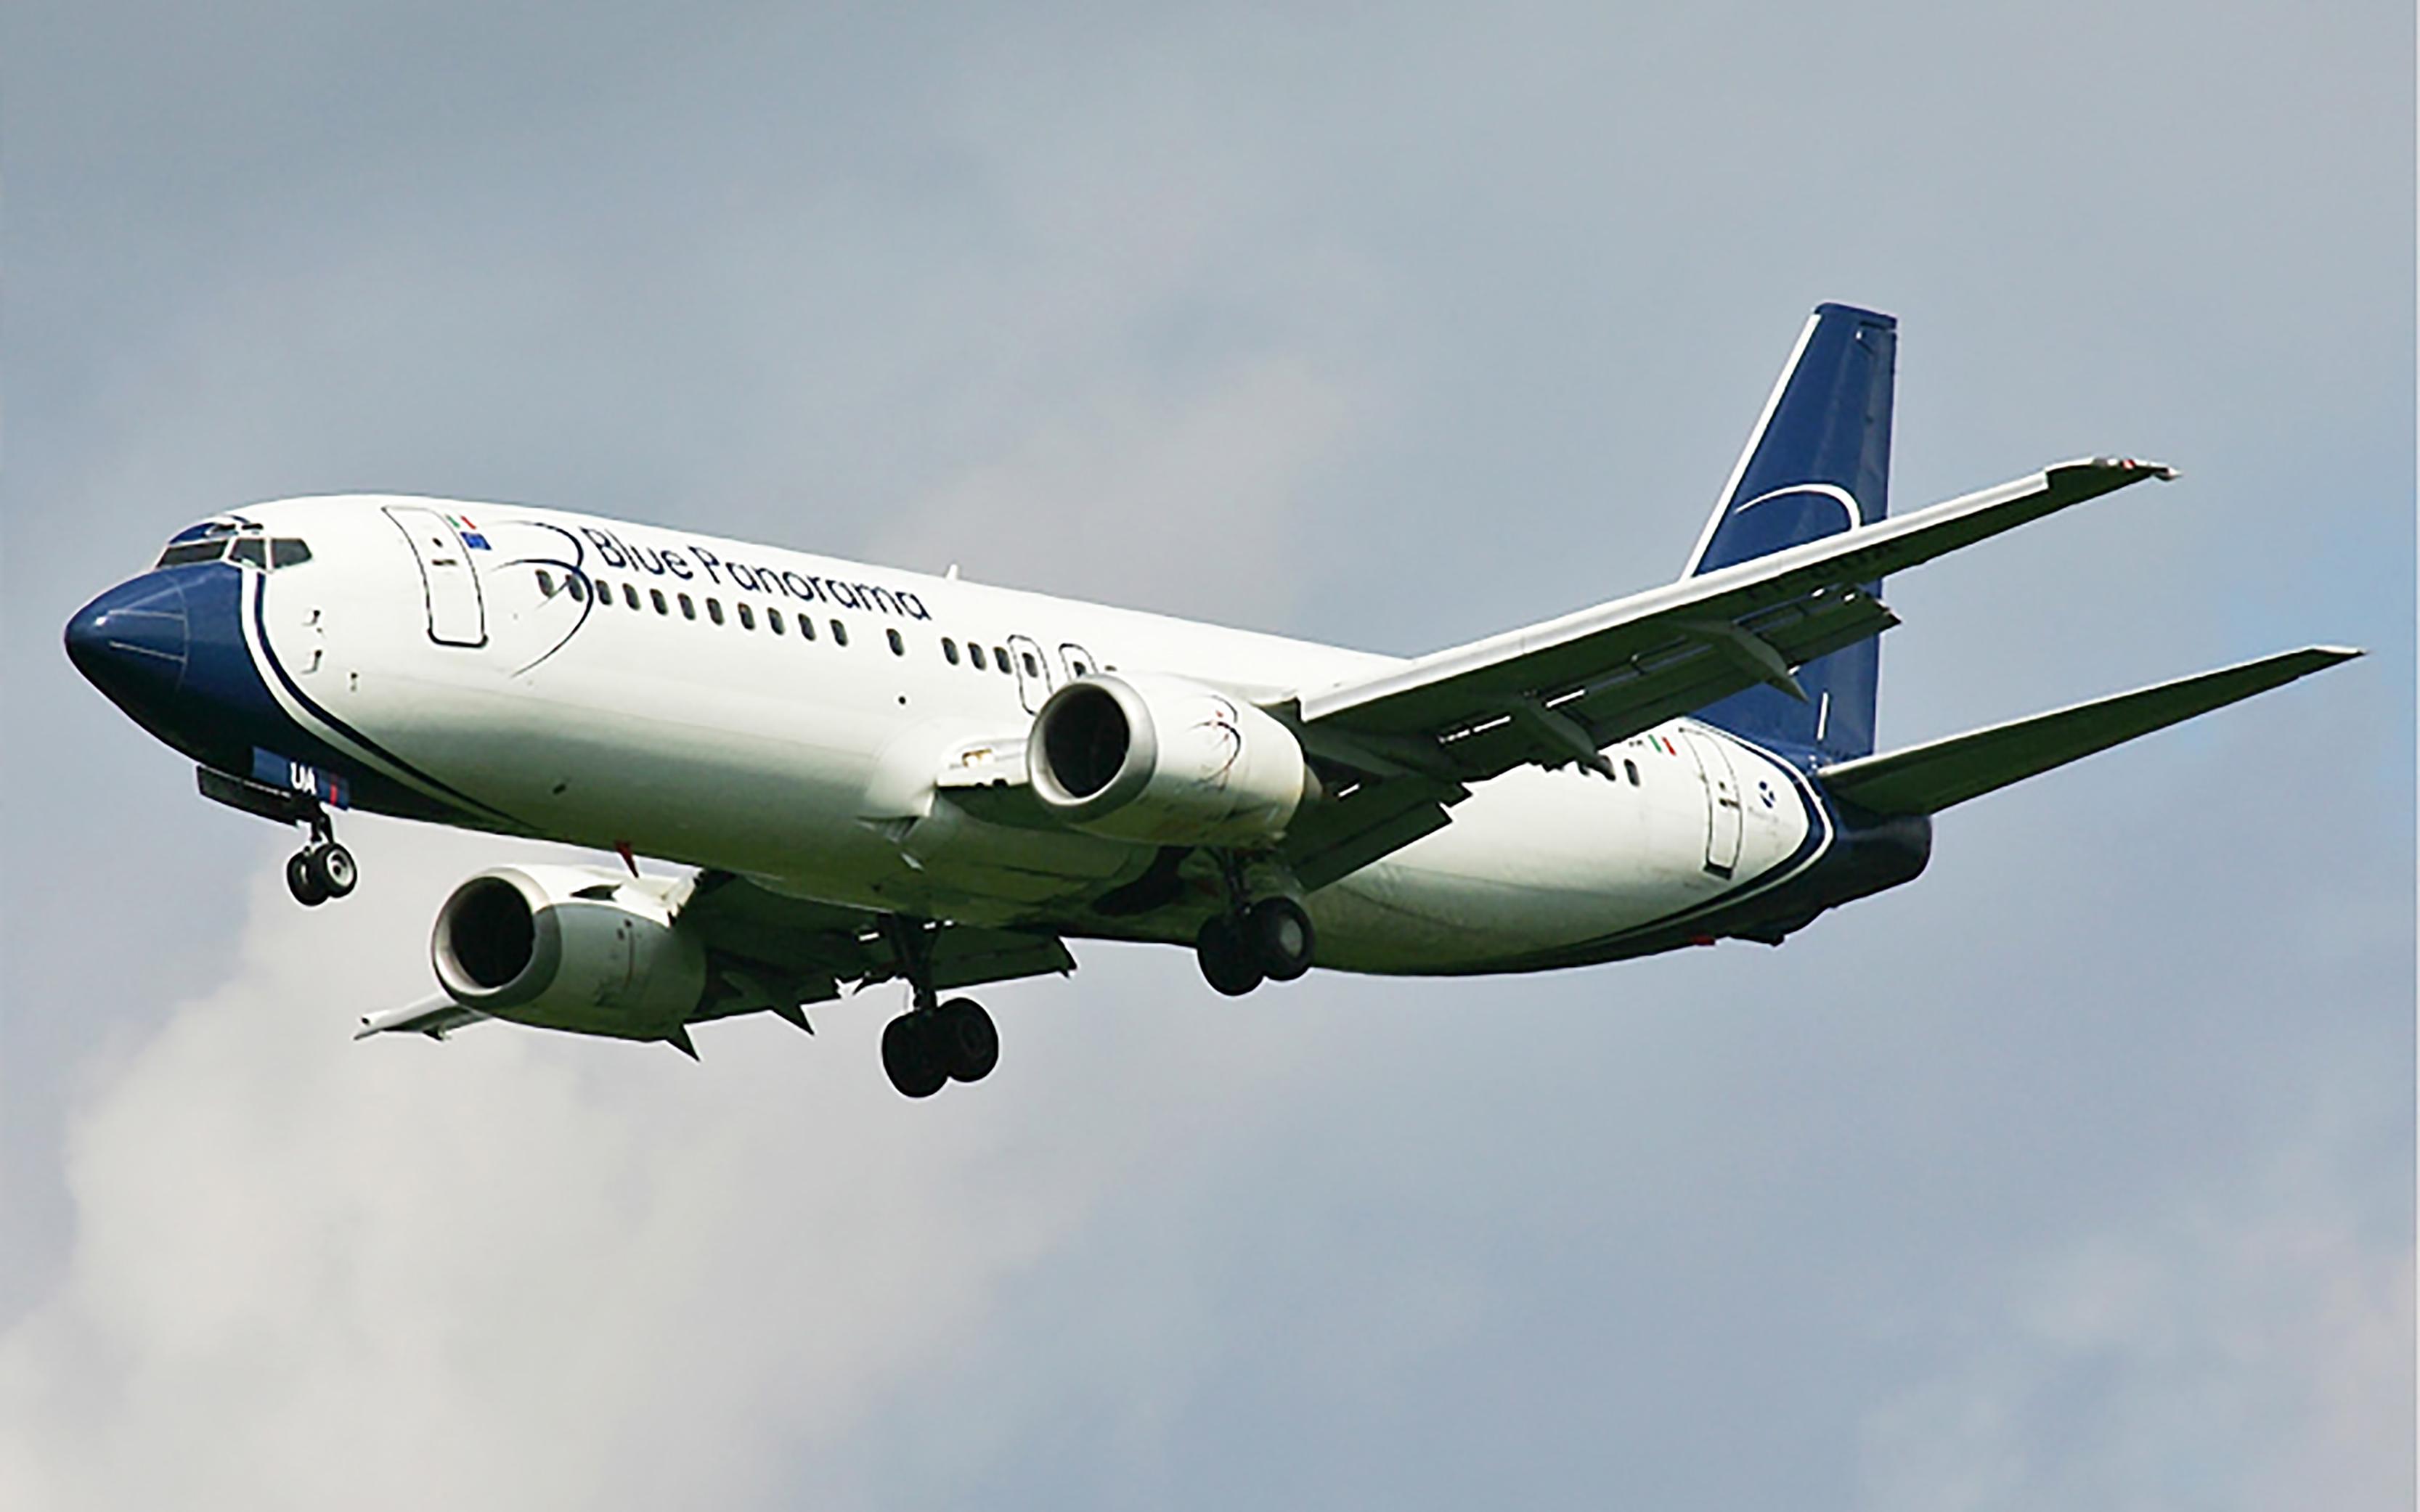 "<ImageCaption xmlns=""http://parkcloud.net/internal"">ParkCloud partners with Blue Panorama Airlines</ImageCaption>"